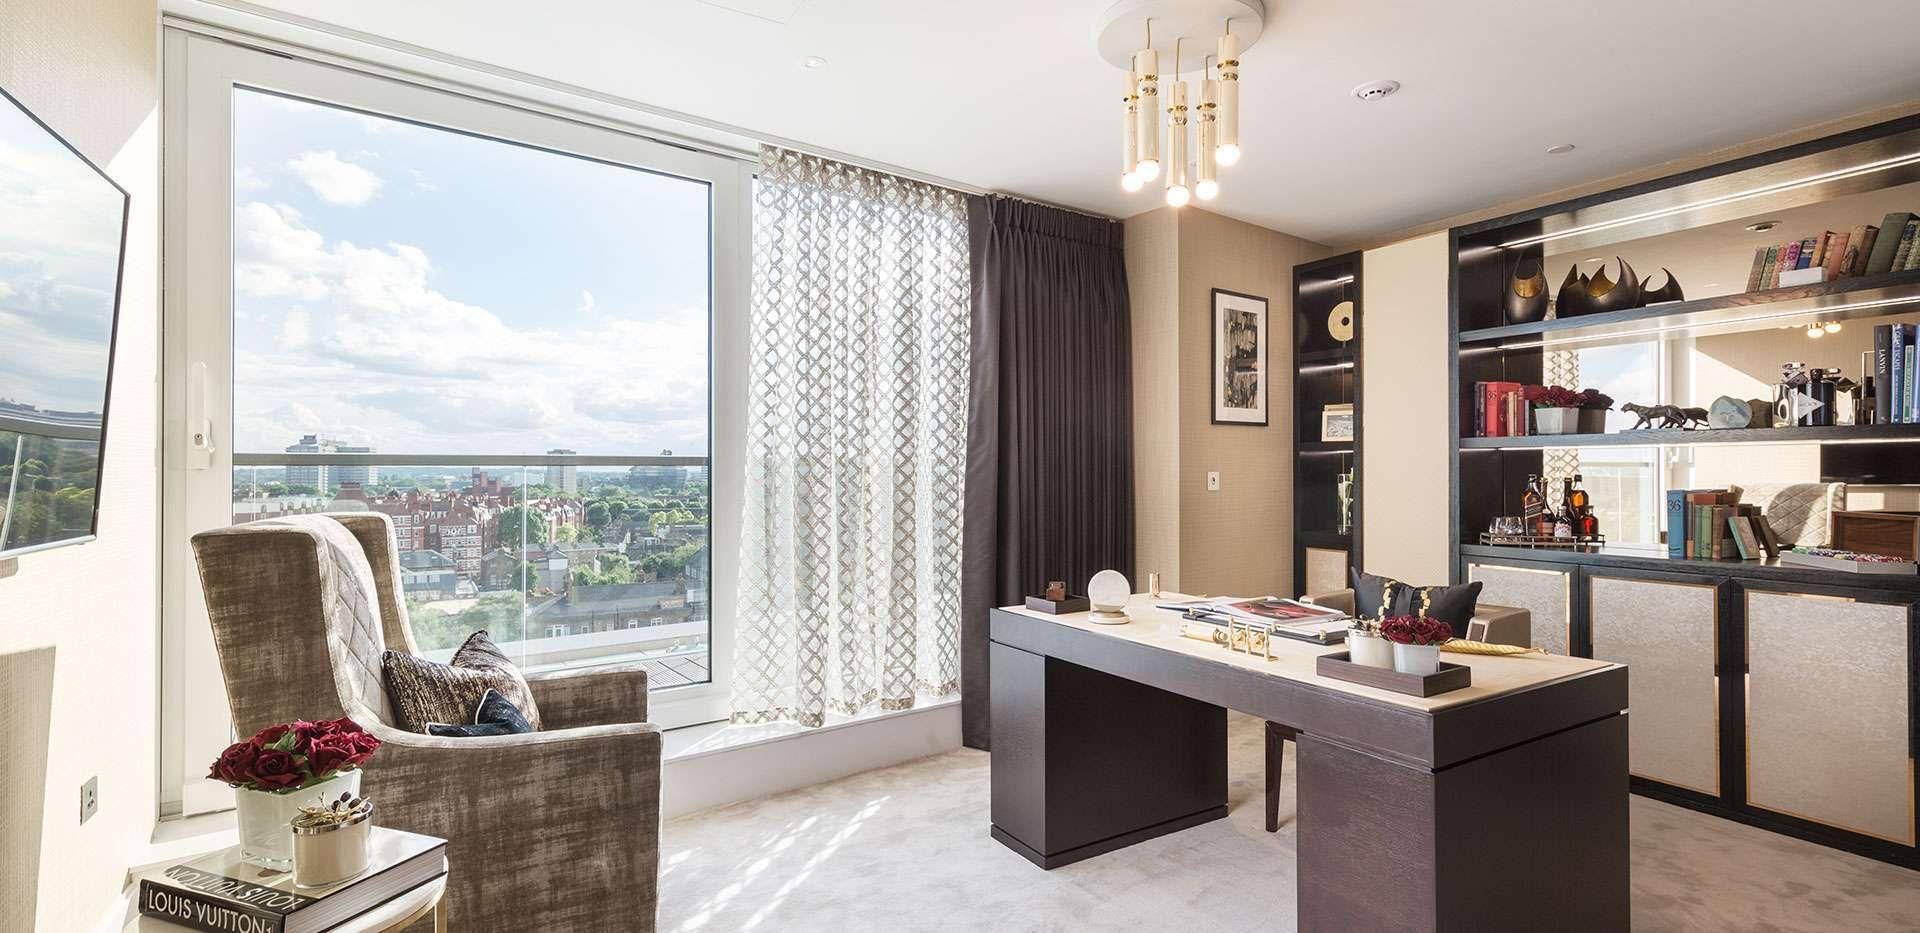 375 kensington high street new apartments in kensington st edward